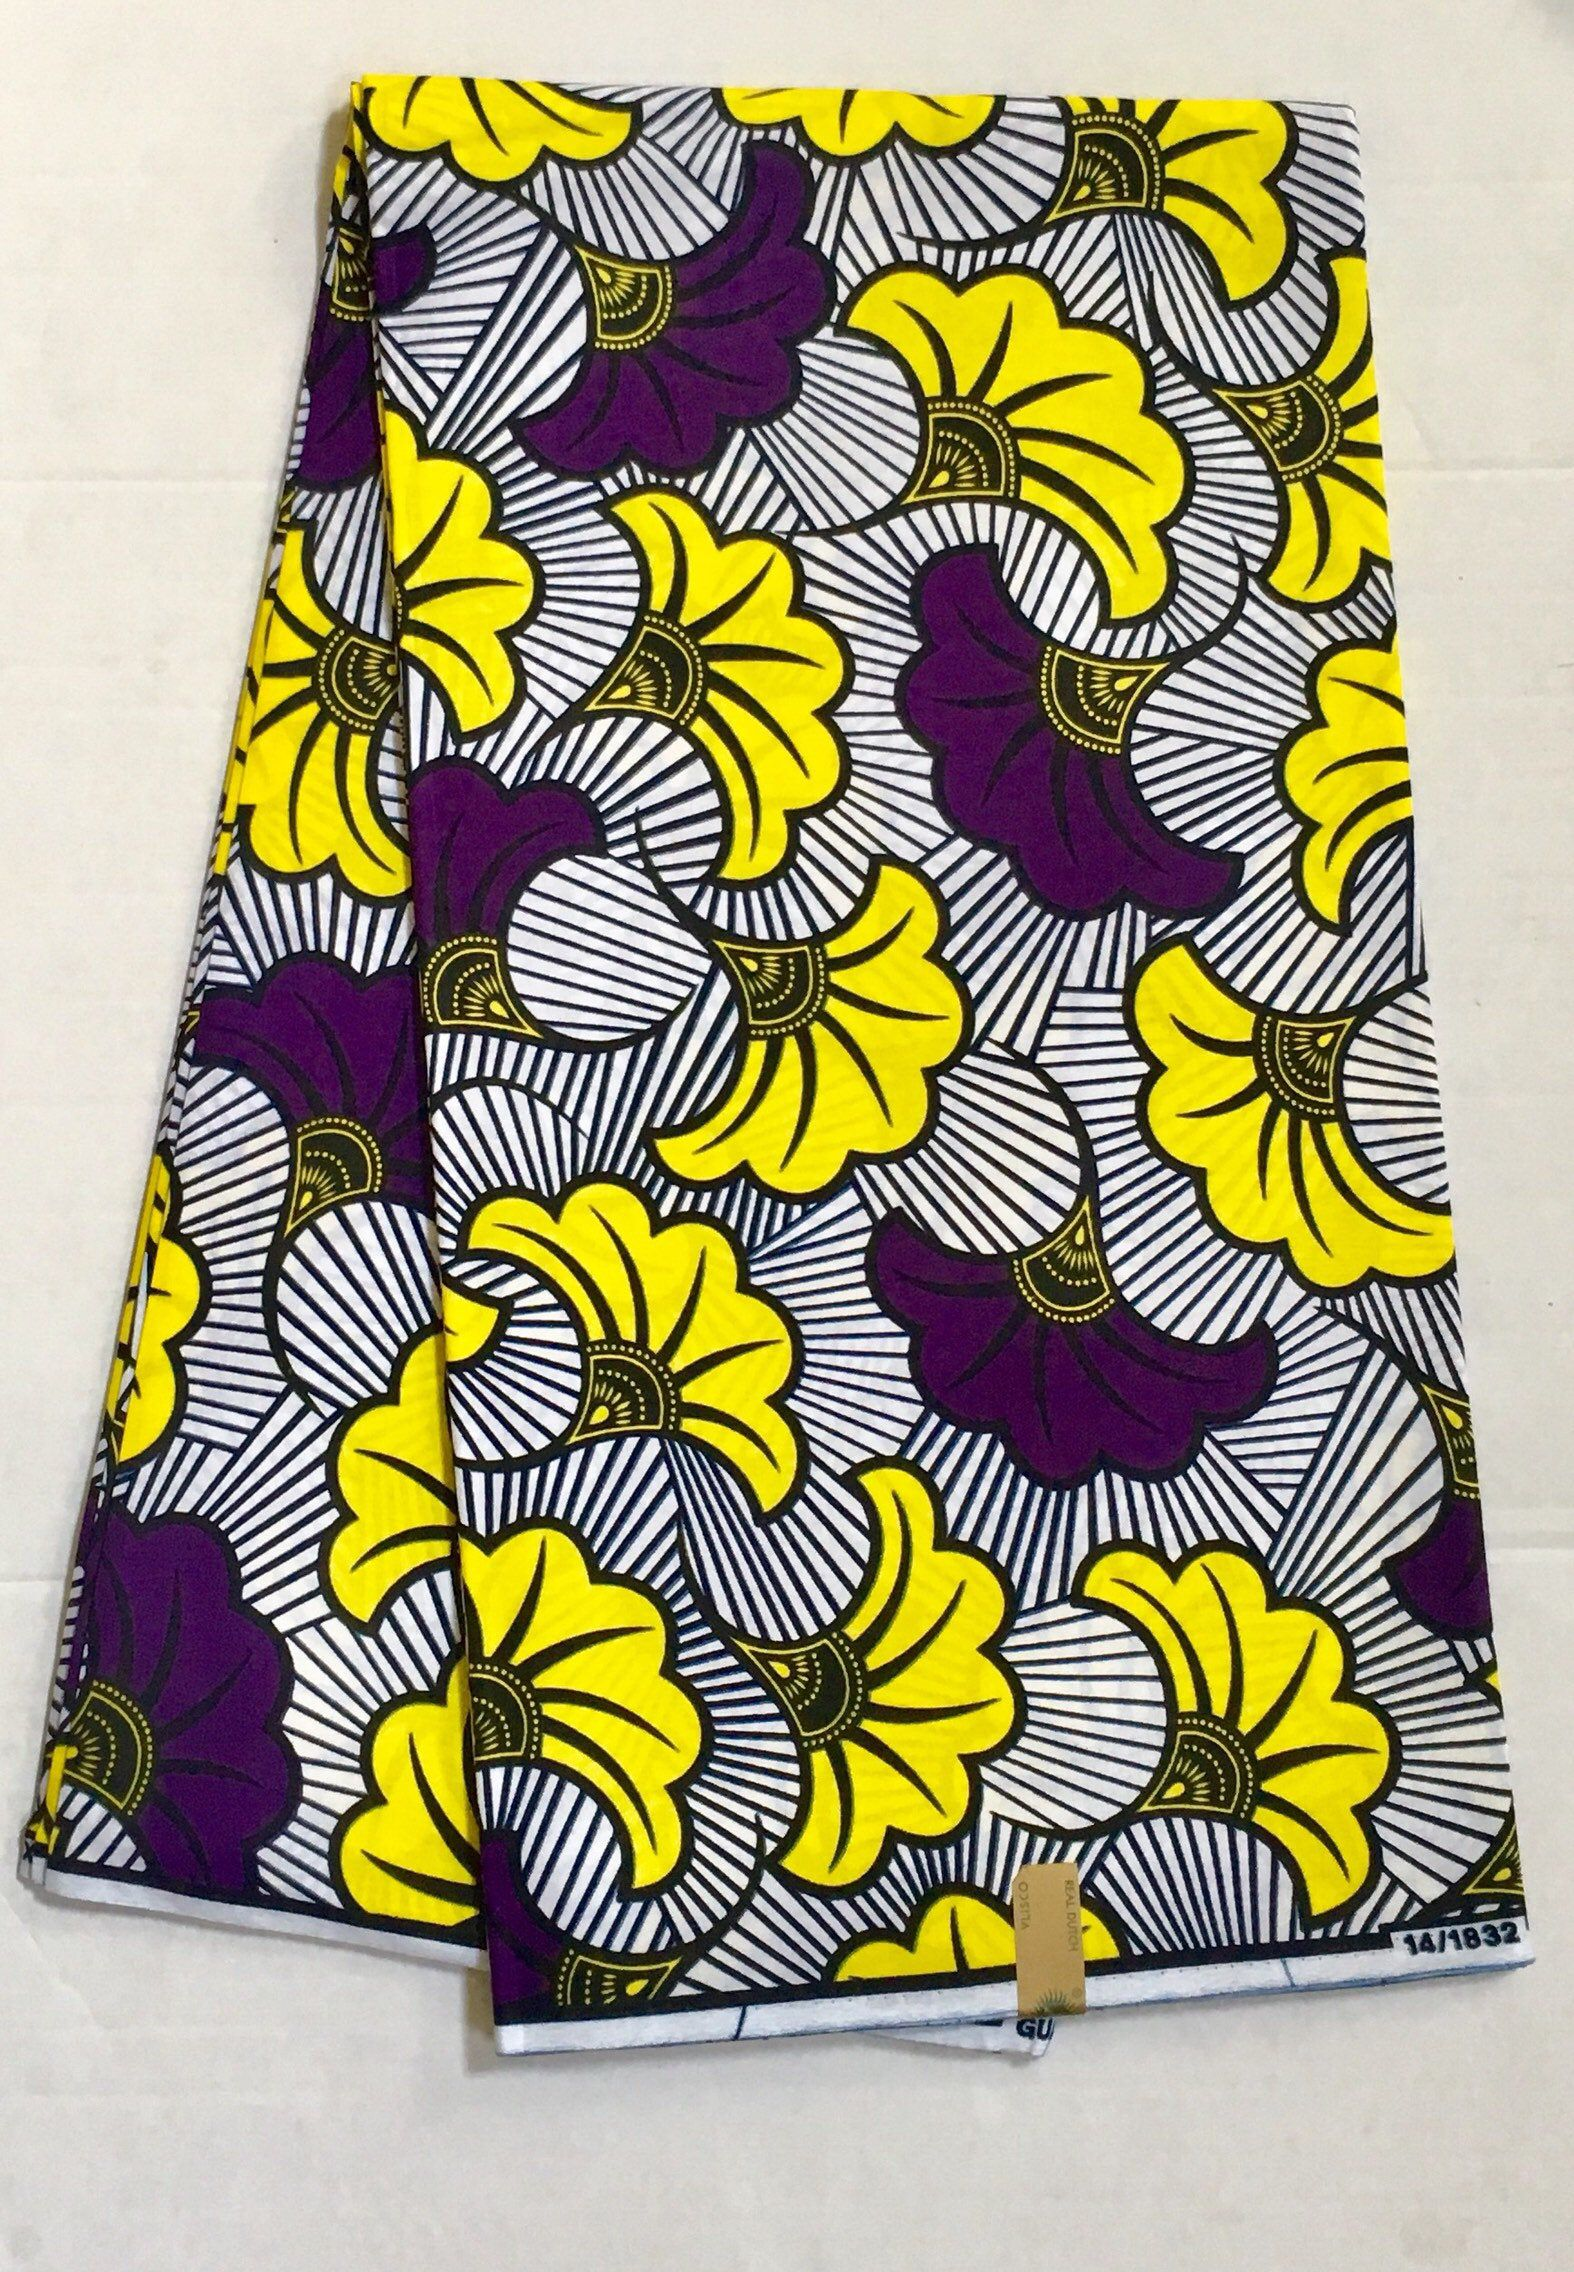 wholesale fabric tribal fabric dark green and yellow fabric. African Fabrics 6 yards wholesale african fabric ankara